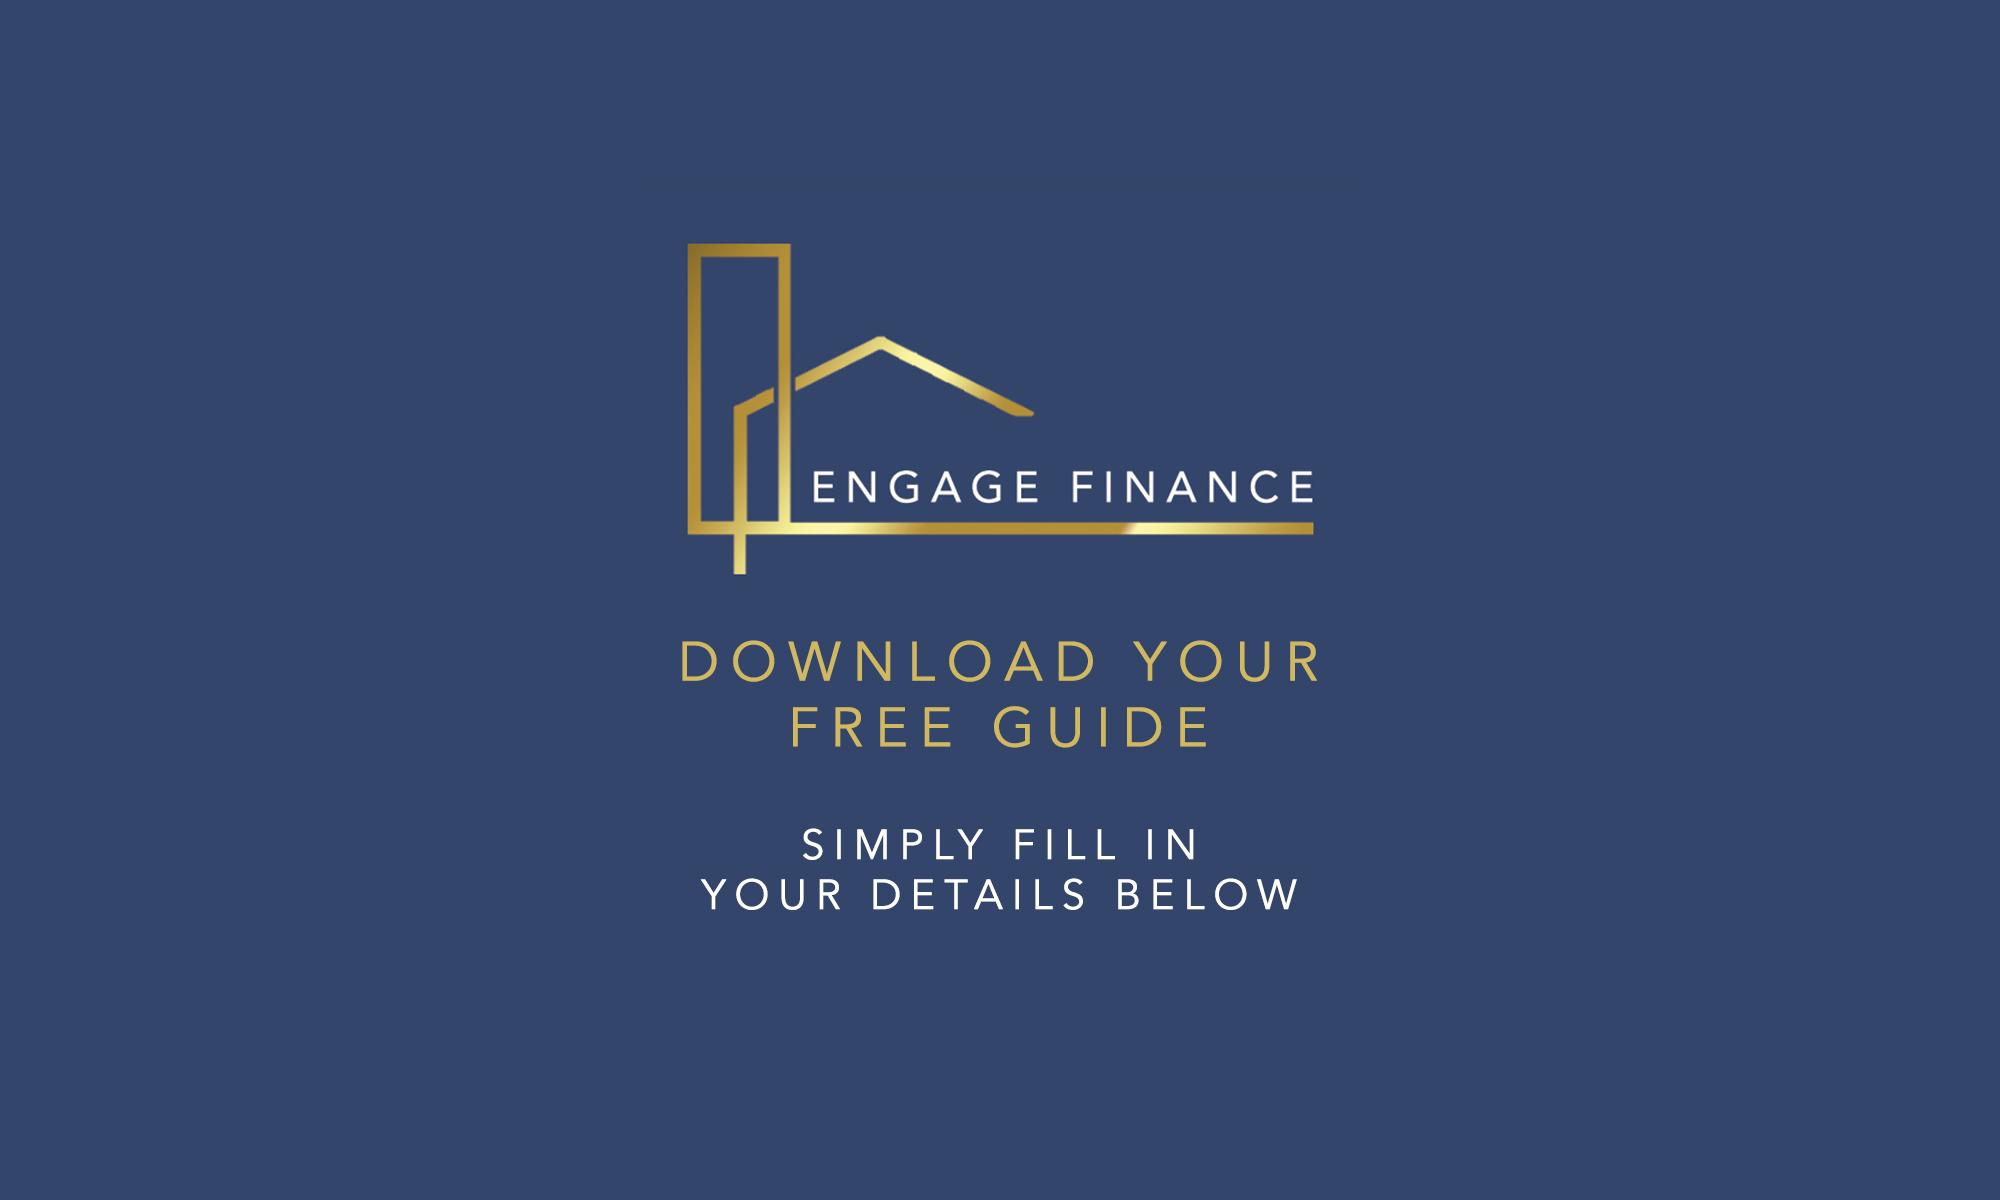 Engage Finance